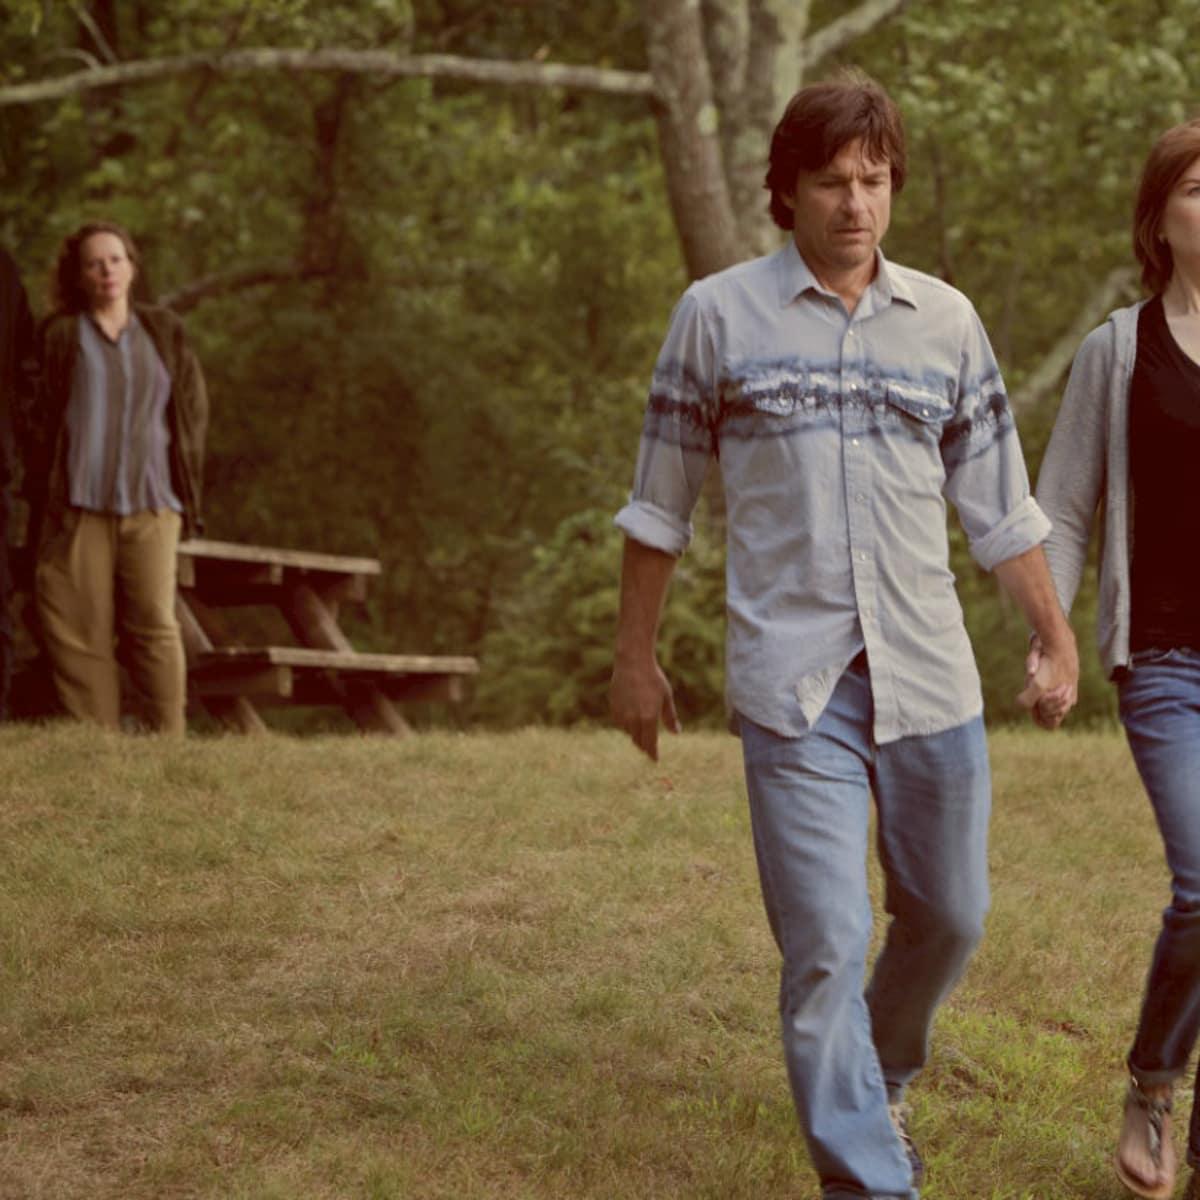 Christopher Walken, Maryann Plunkett, Jason Bateman, and Nicole Kidman in The Family Fang